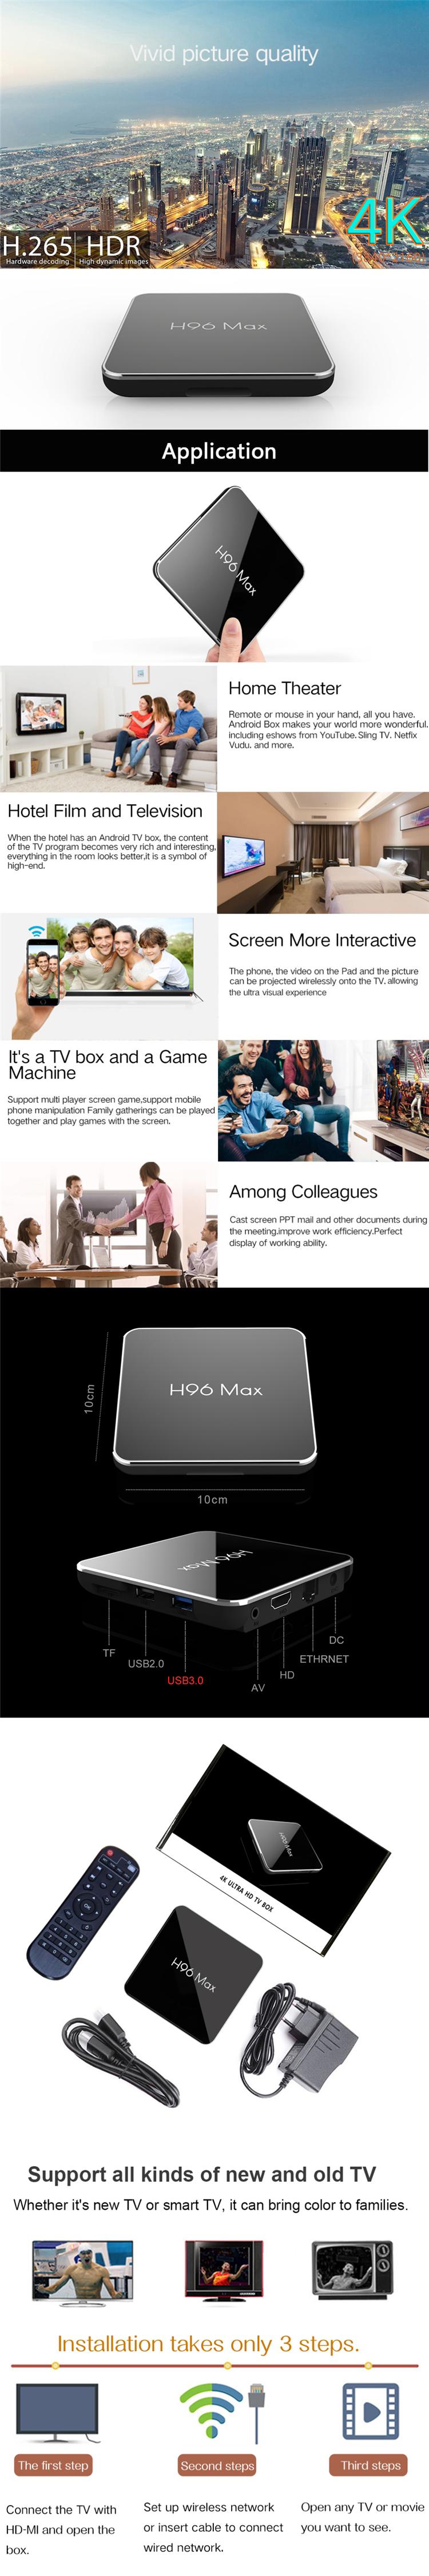 H96 MAX S905X2 -3.jpg